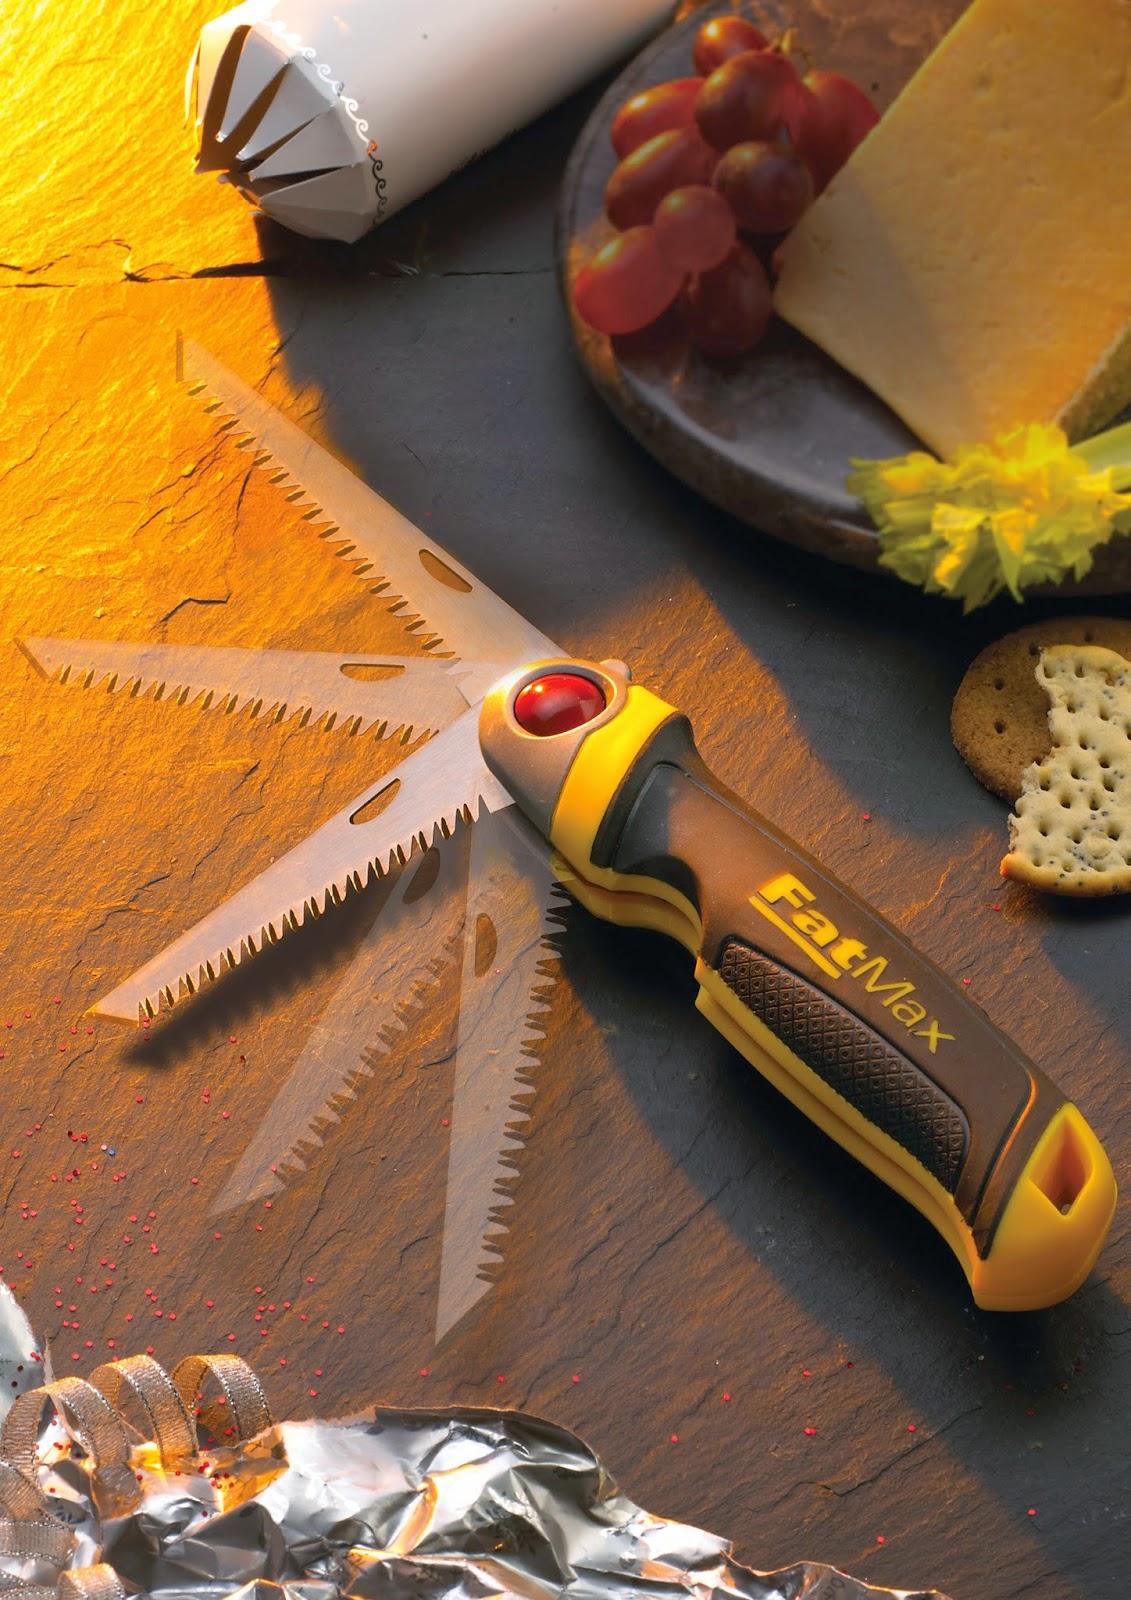 http://www.beesleyandfildes.co.uk/stanley-folding-jab-saw-ref-xms14jab/